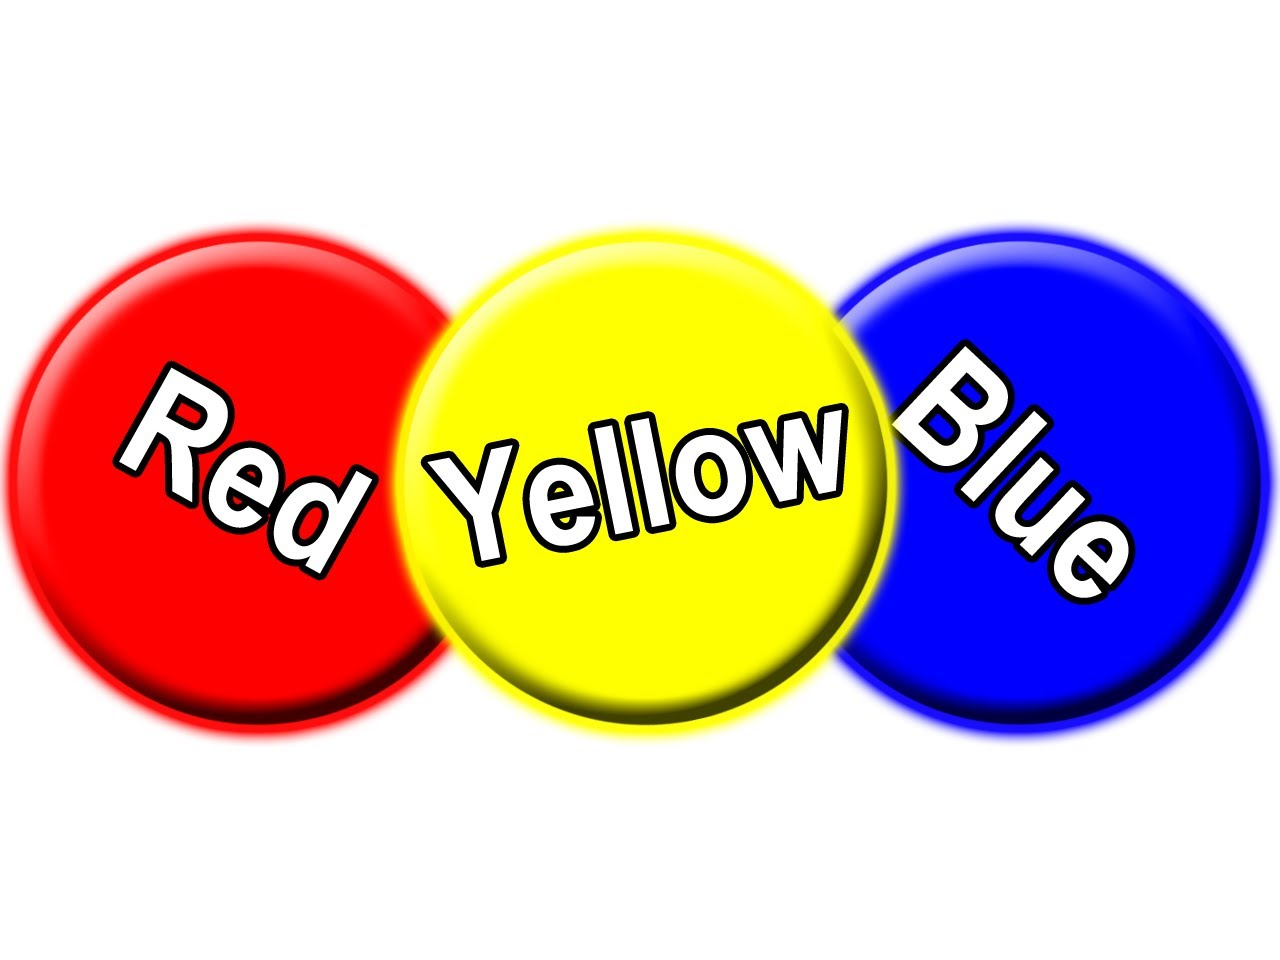 1280x960 Red Circle, Blue Circle Yellow Circle